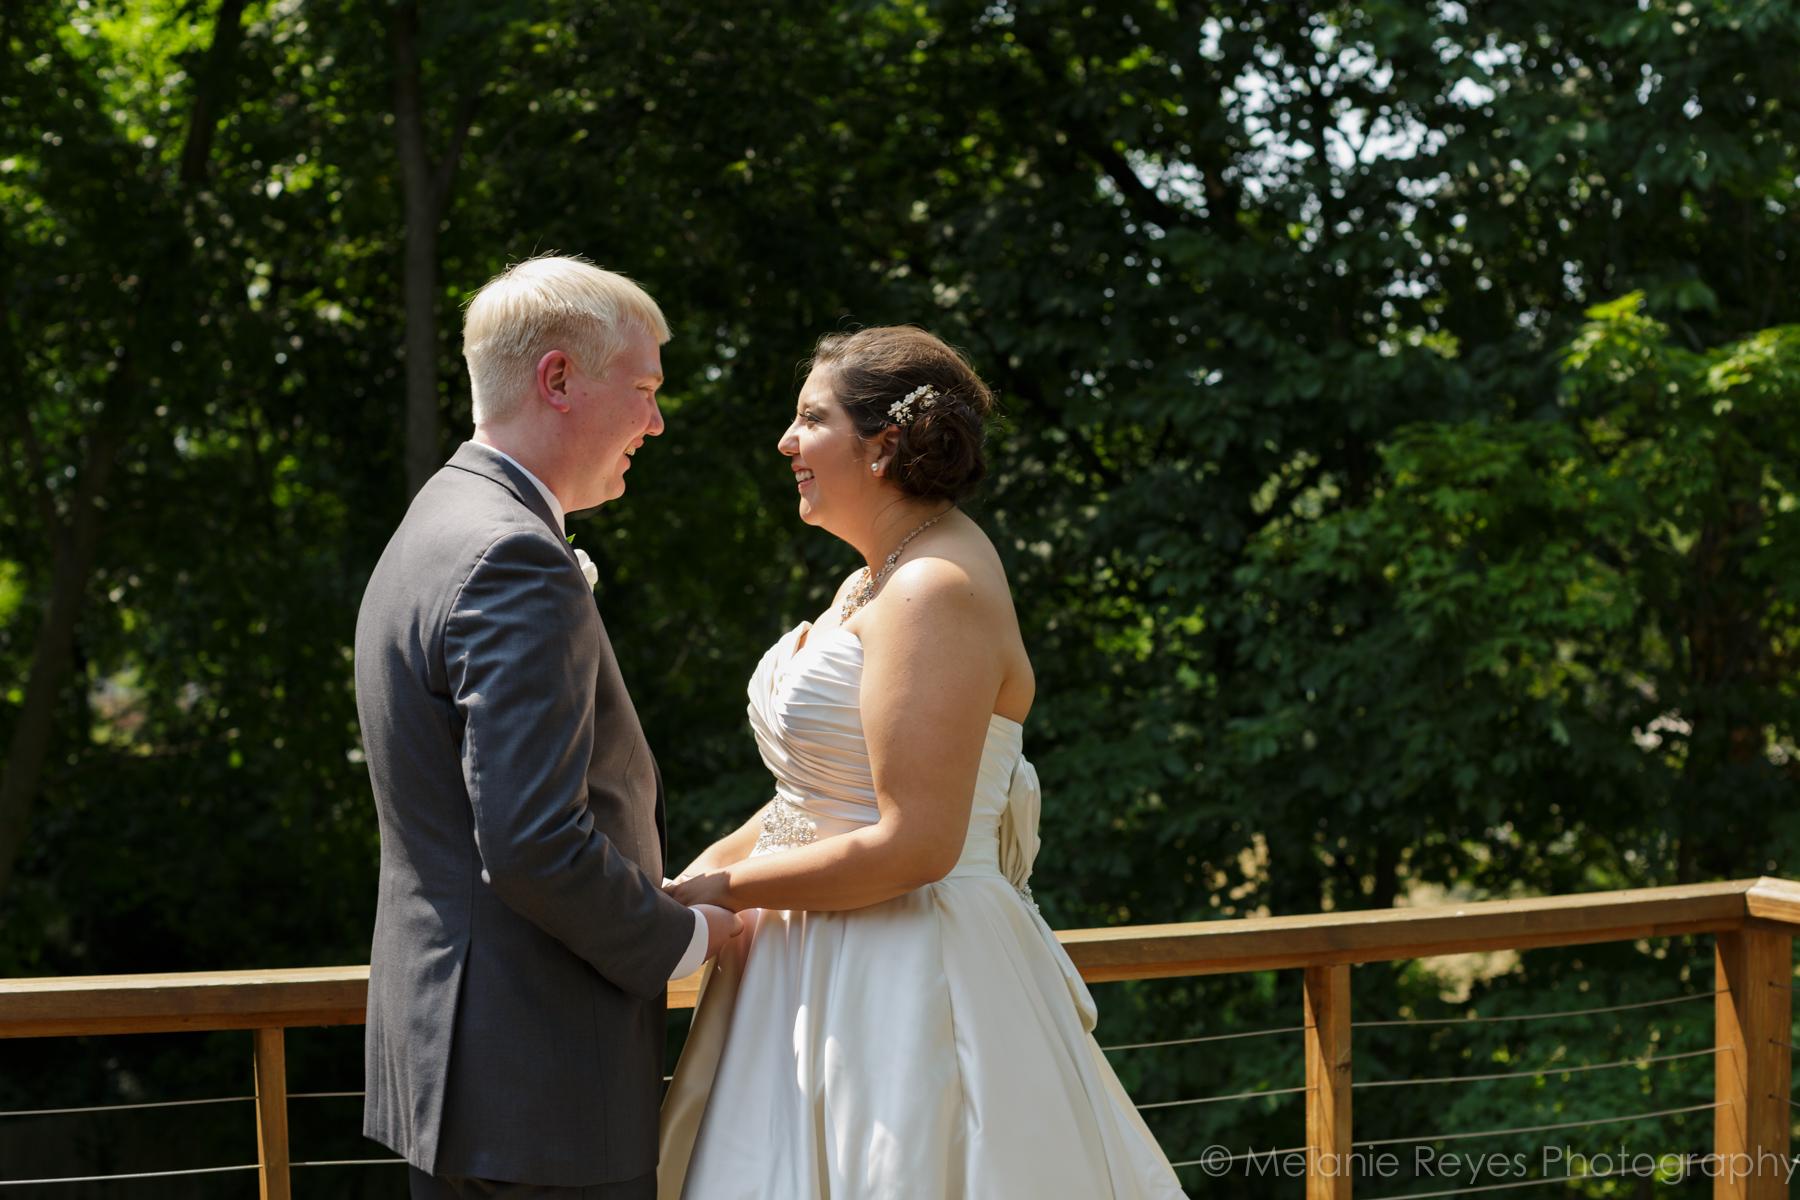 MC_annarbor_uofm_wedding_011